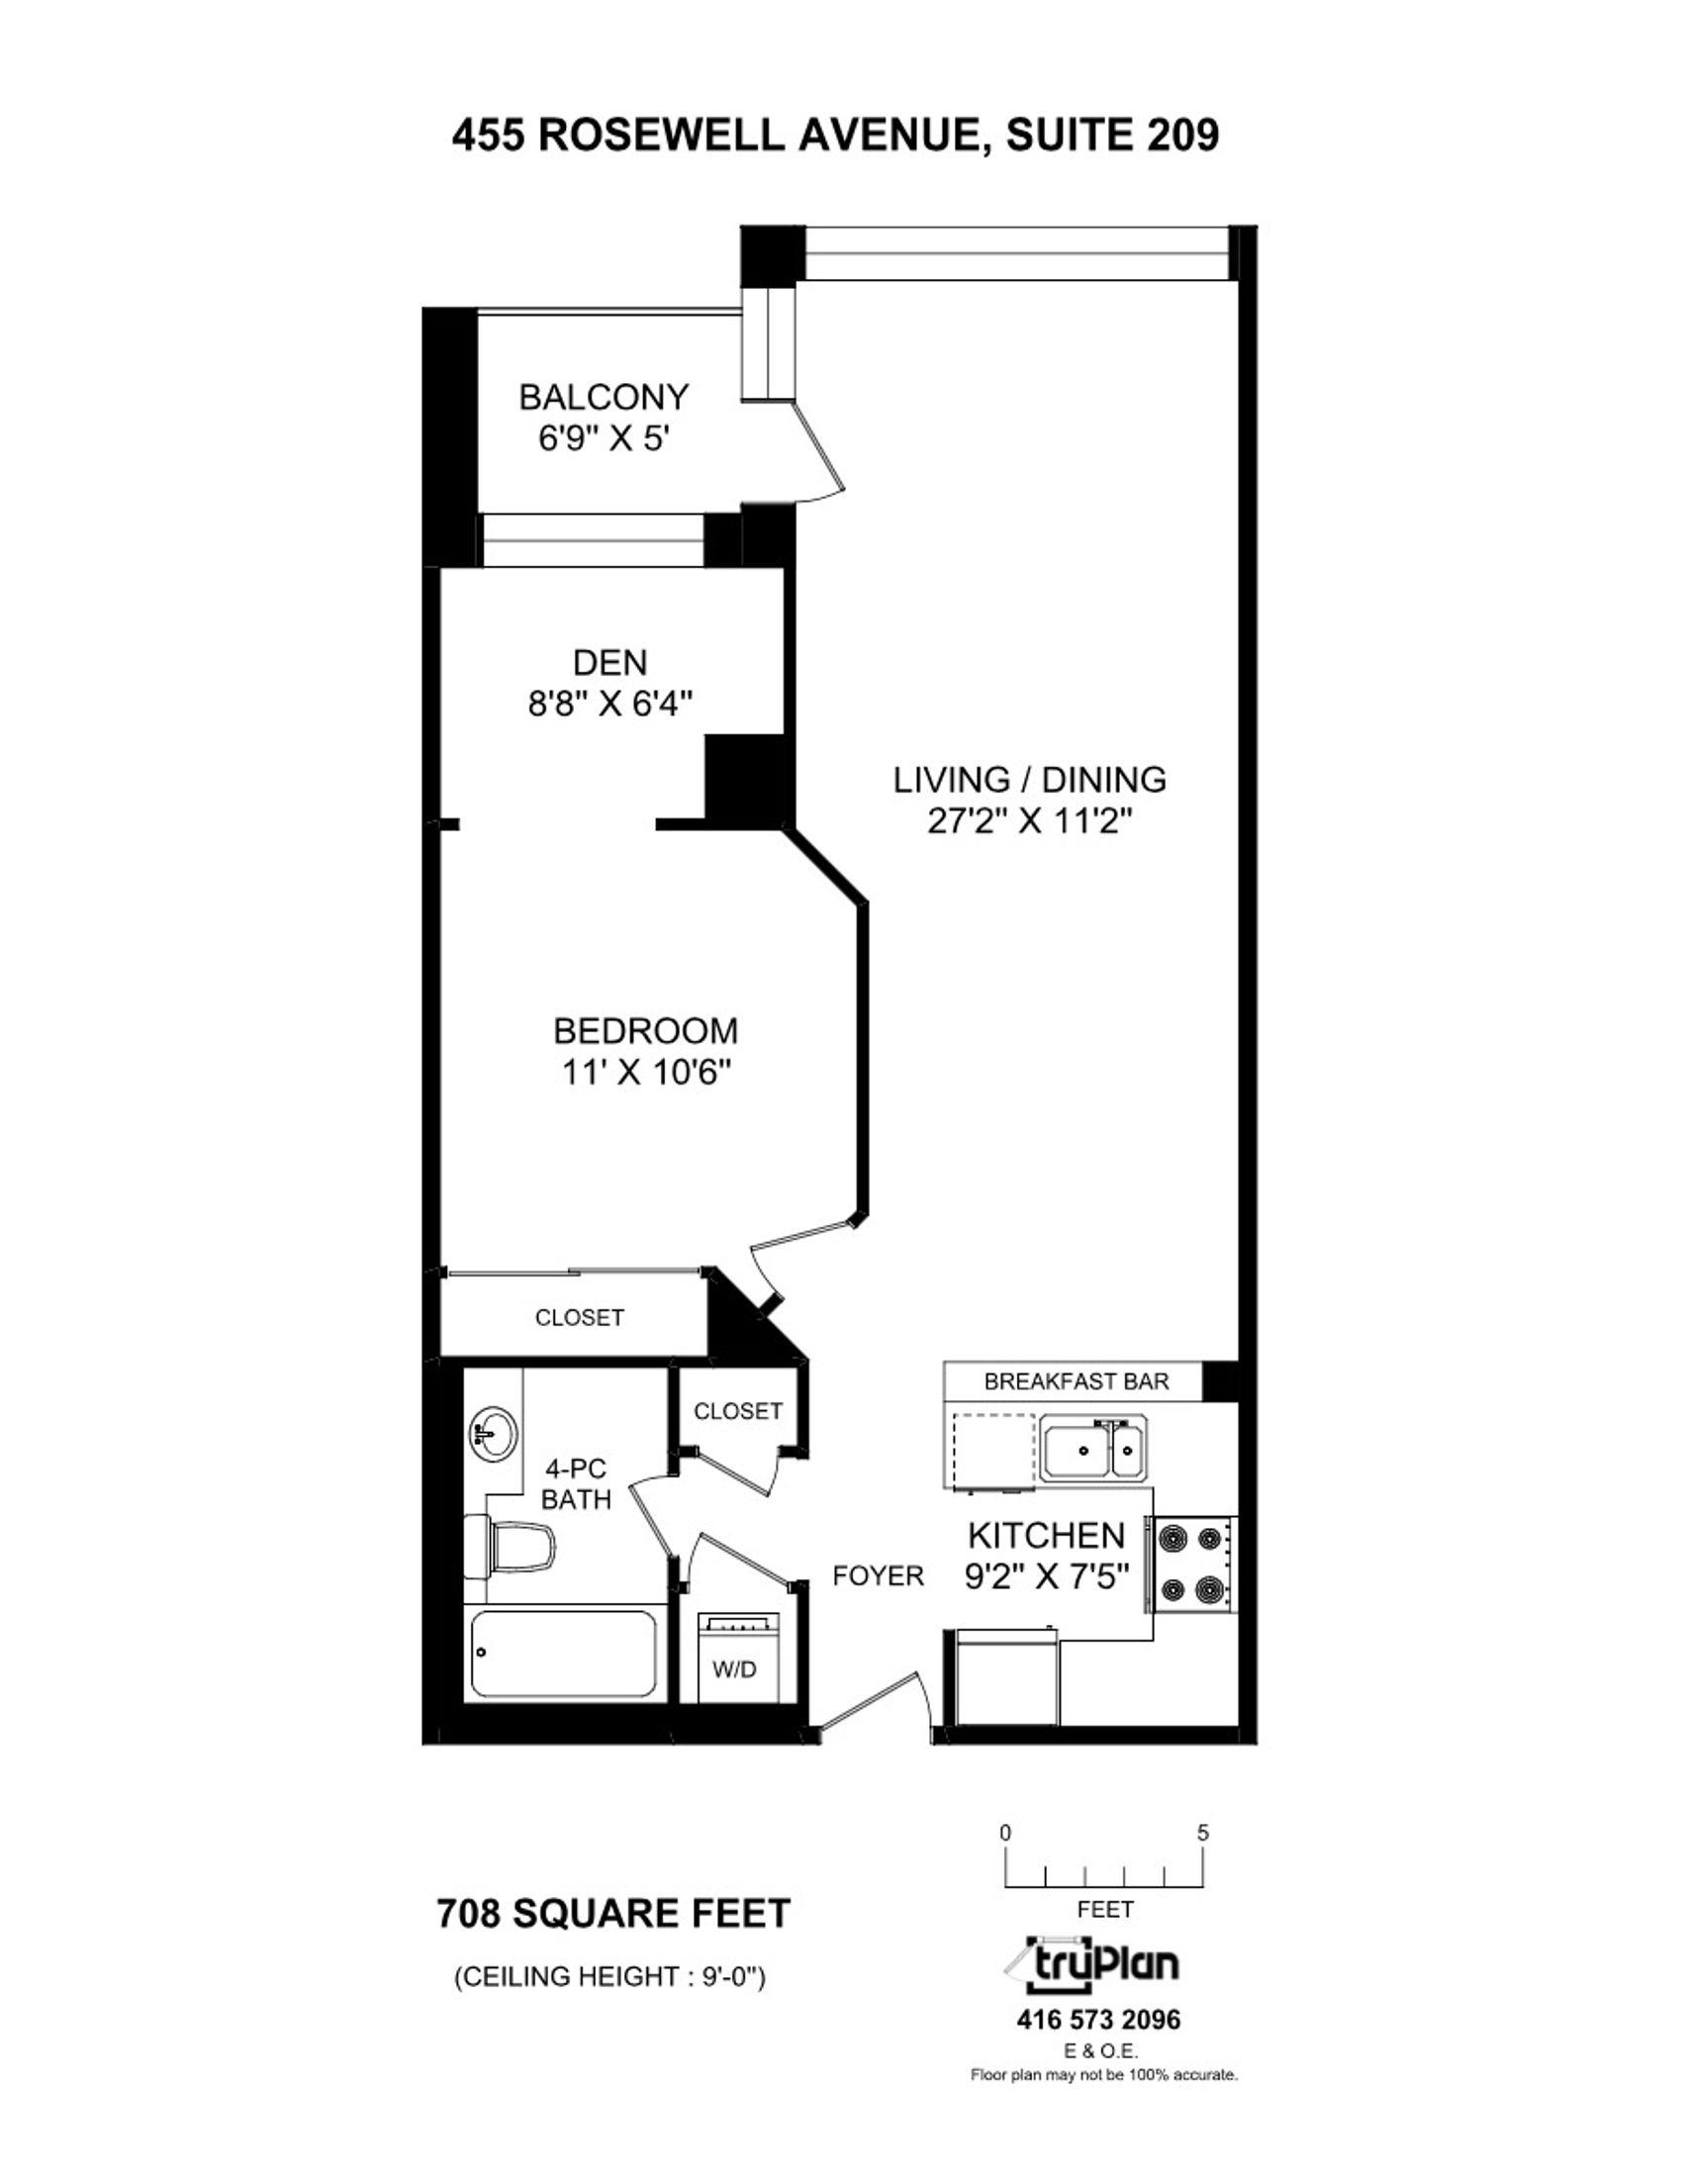 209-455 Rosewell Floor Plan